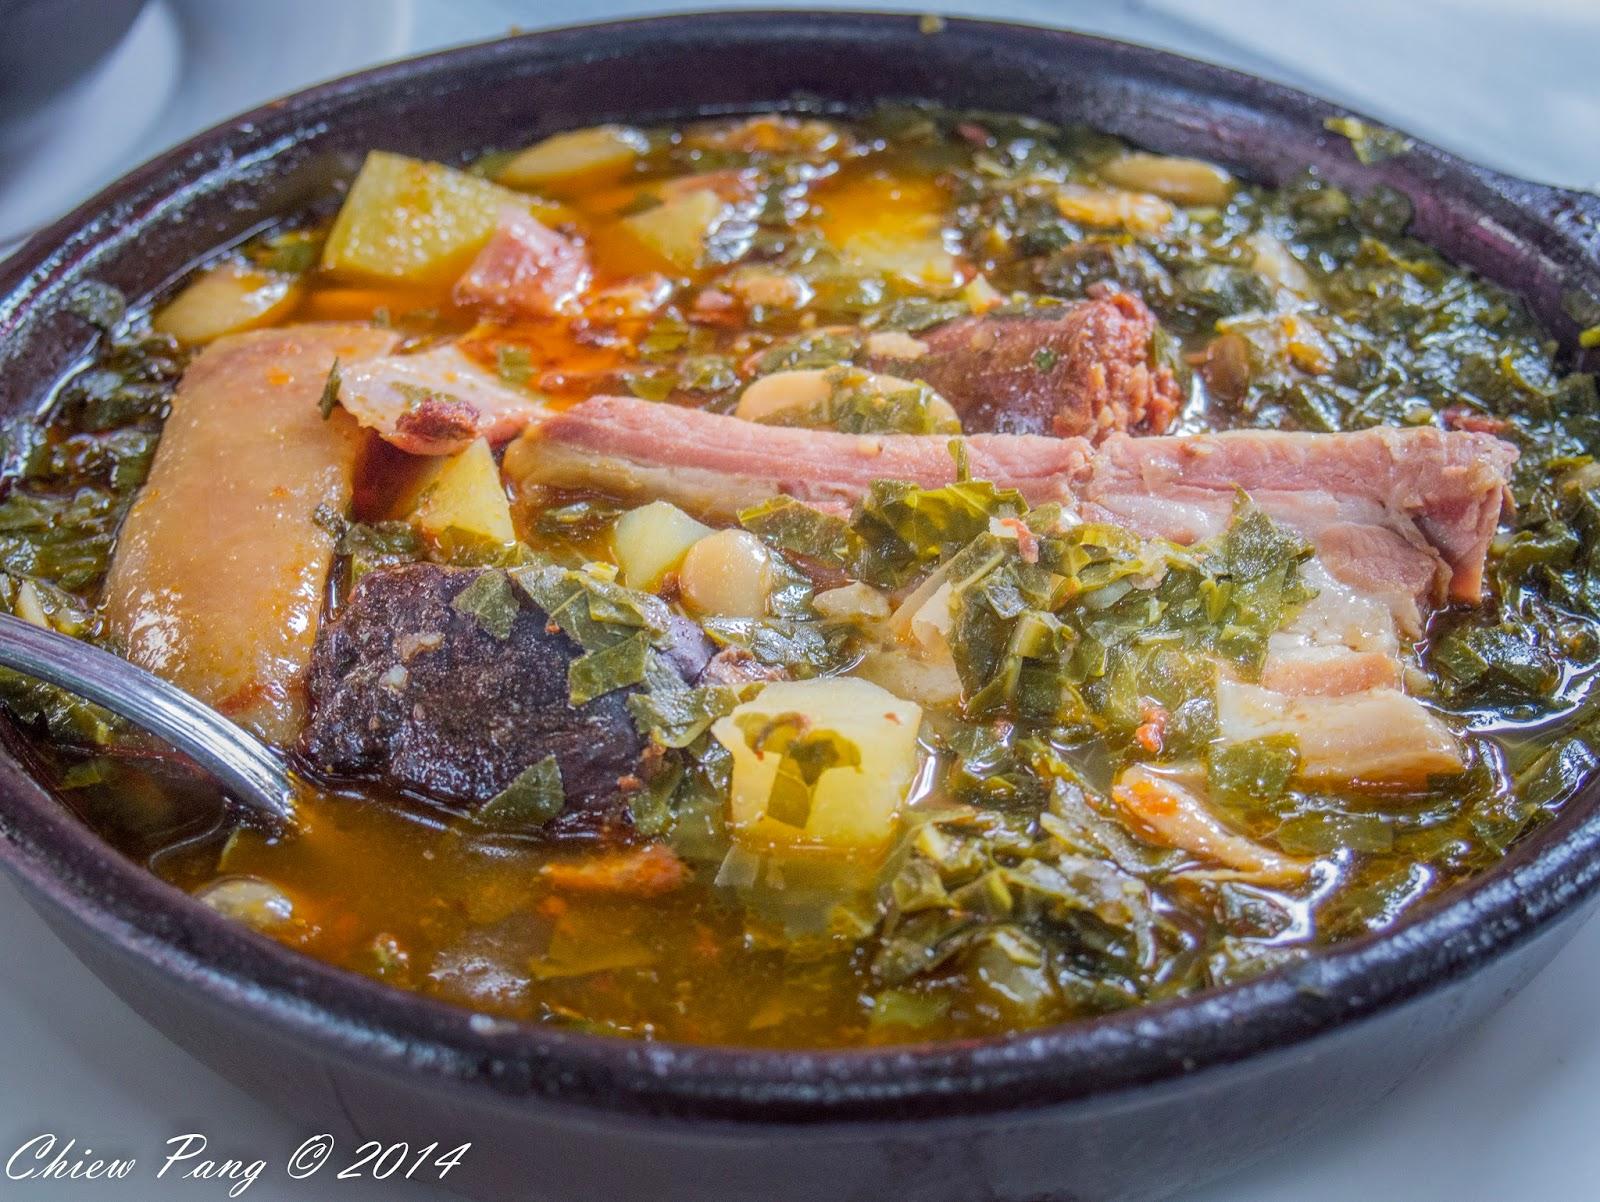 L'Esbardu, restaurant review, Proaza, Asturias